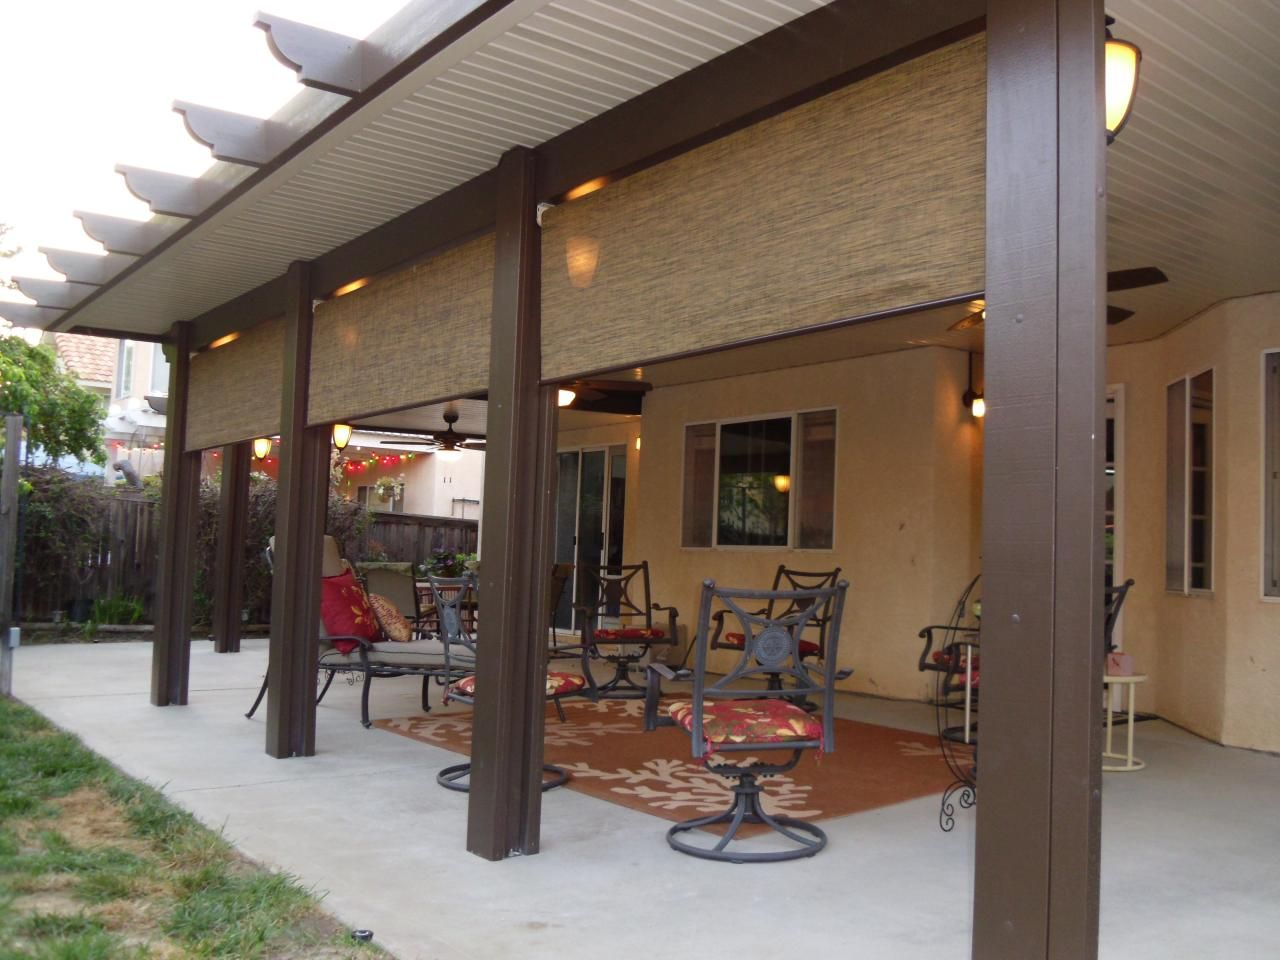 Solid Alumawood Patio Cover Temecula Ca Aluminum Patio with regard to size 1280 X 960